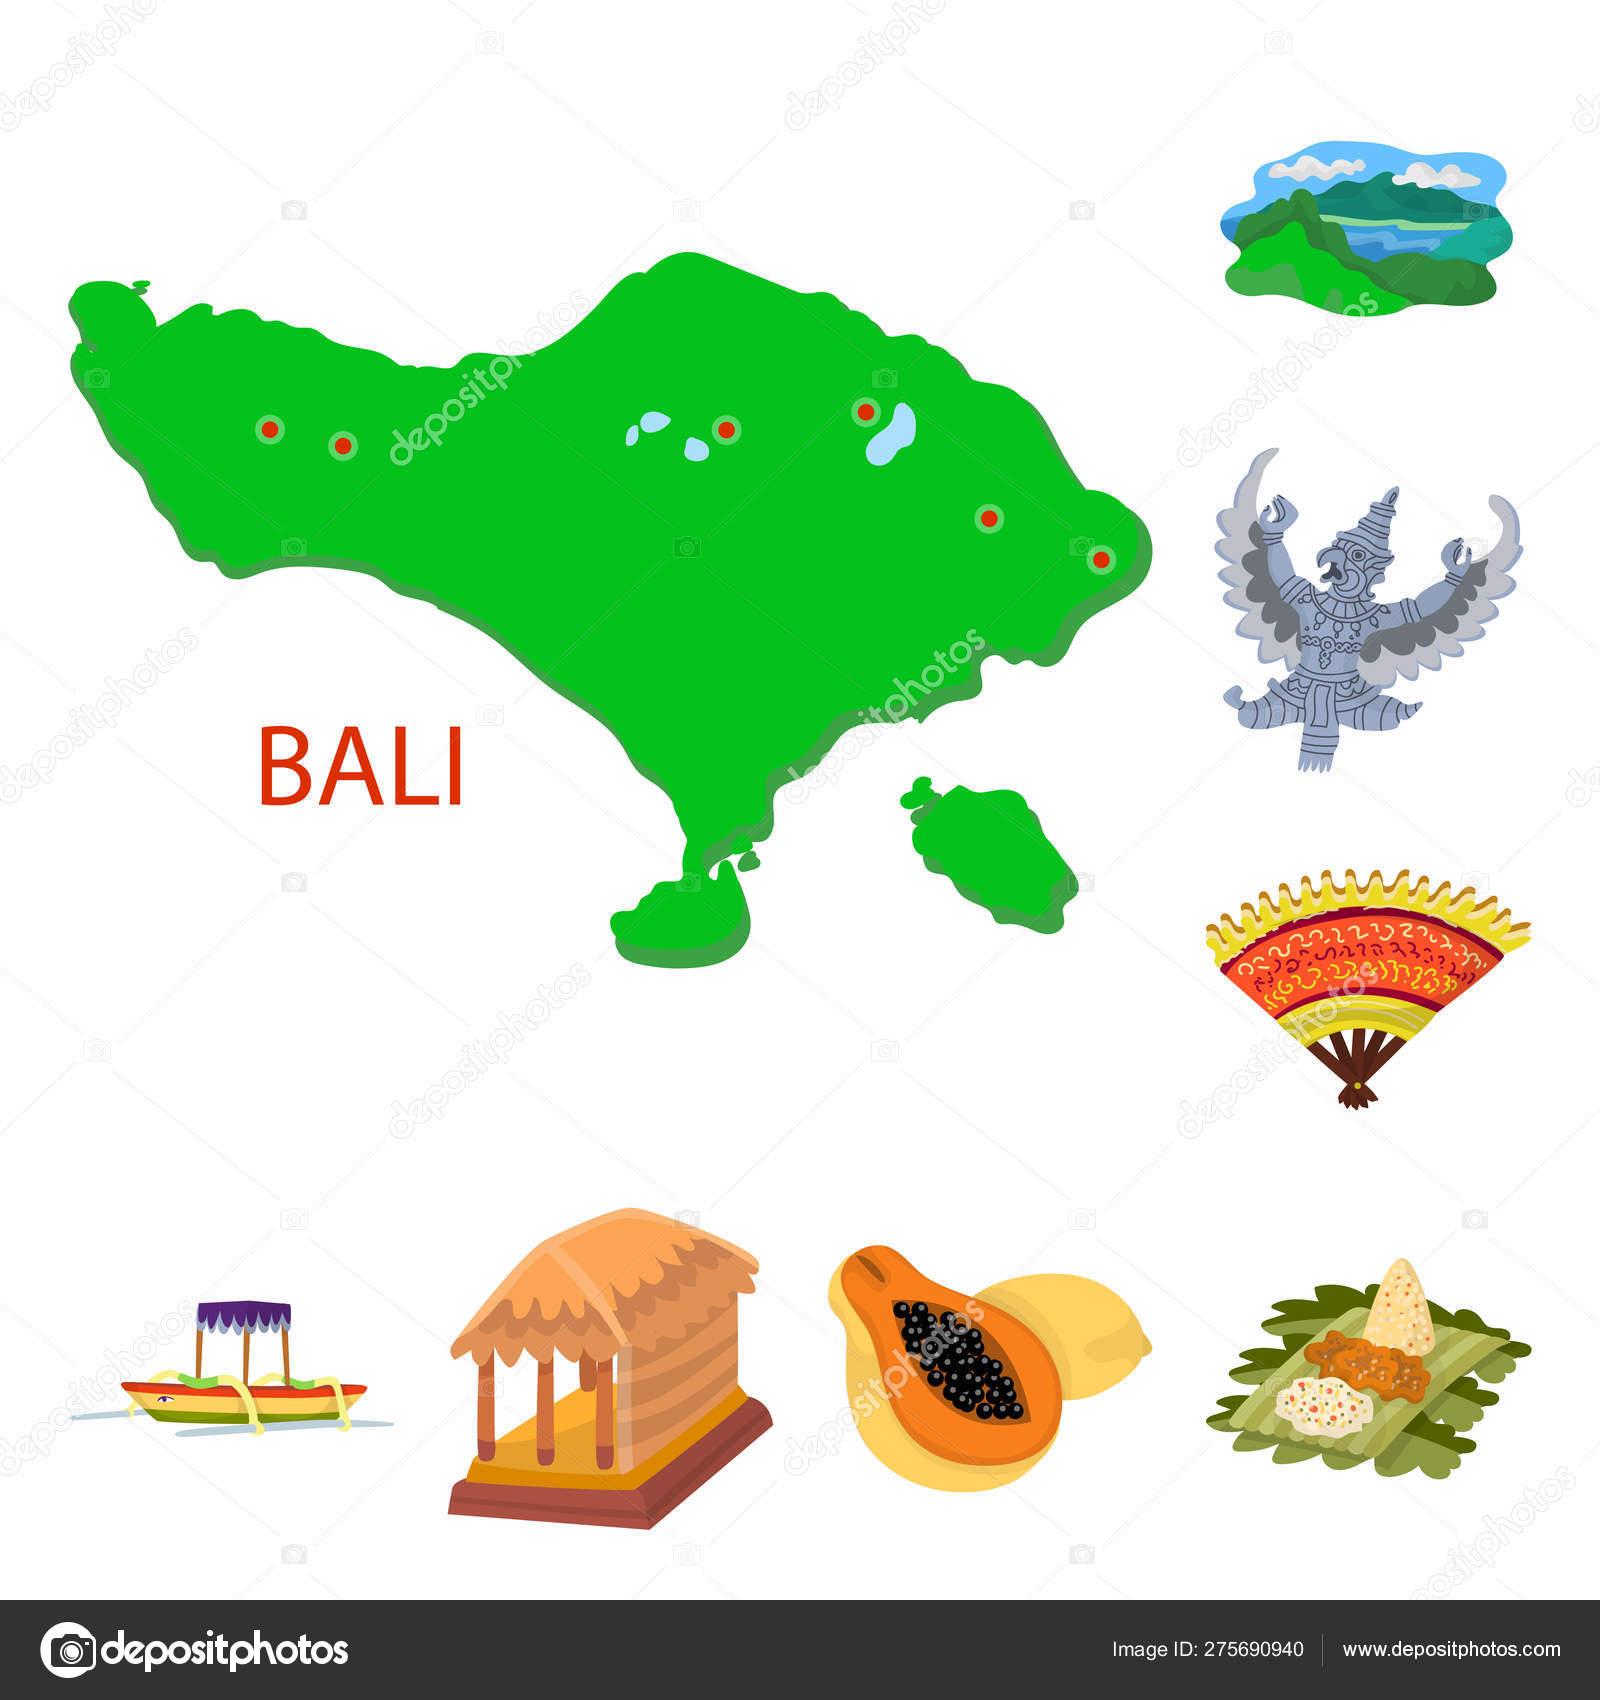 Balinese Cartoon Stock Vectors Royalty Free Balinese Cartoon Illustrations Depositphotos